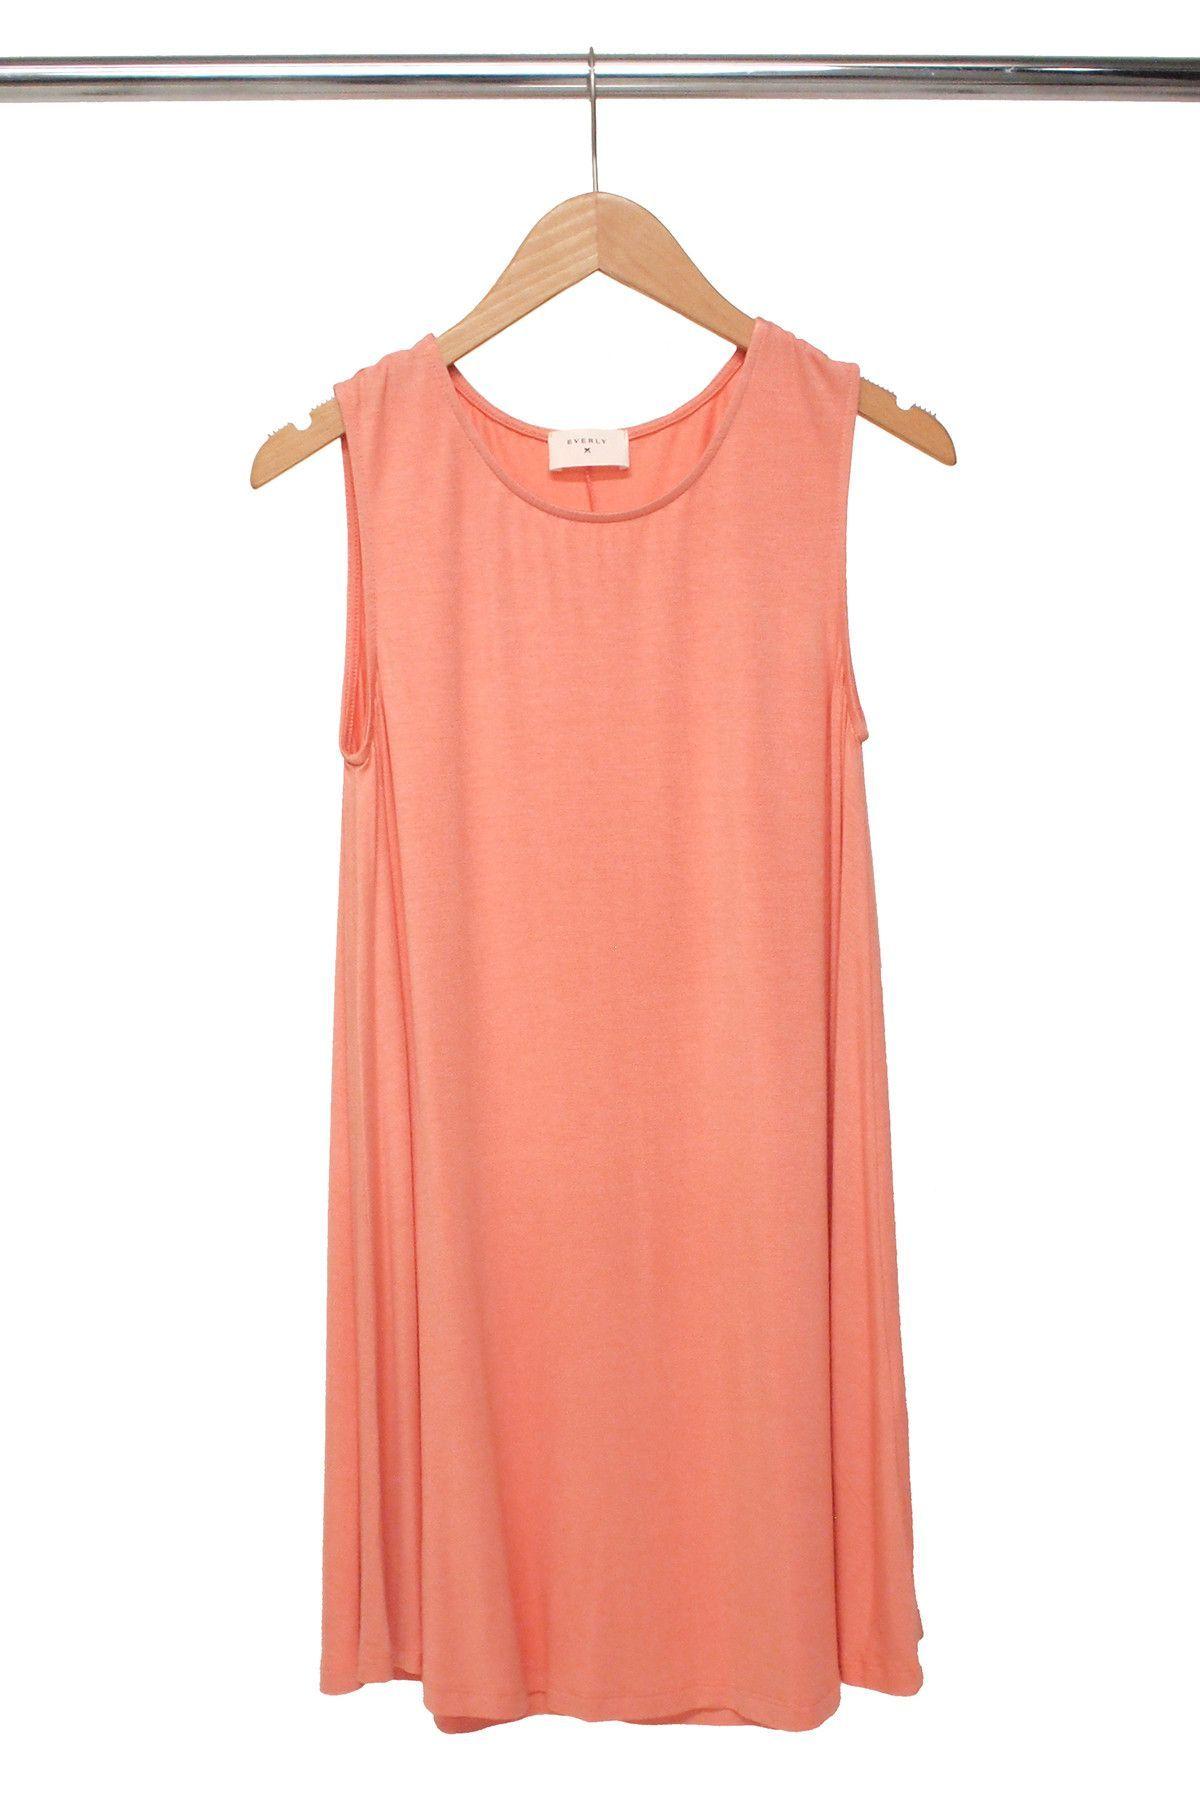 Constance Peach Trapeze Dress